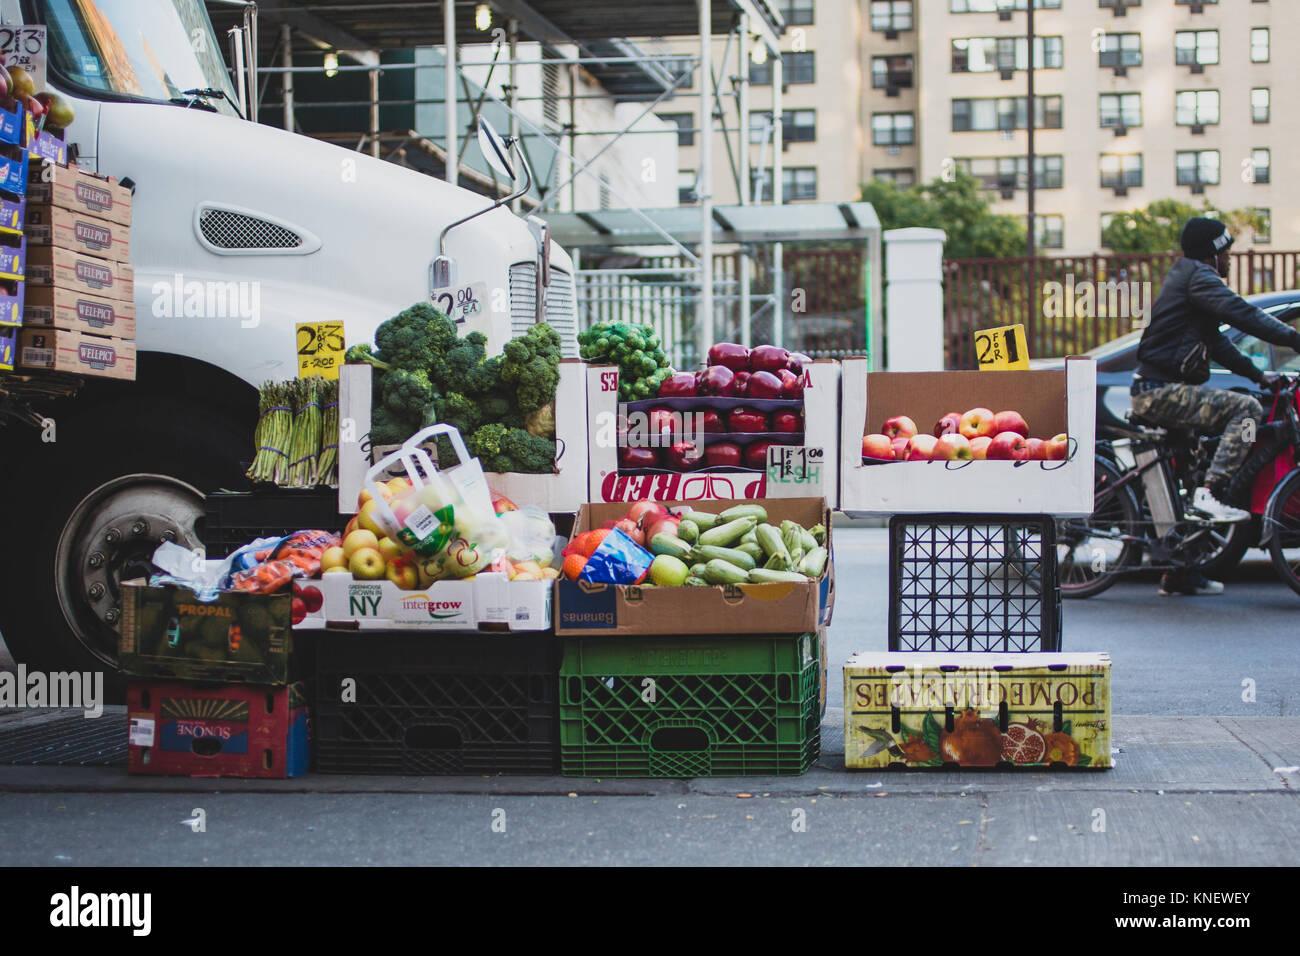 York Market Stock Photos & York Market Stock Images - Alamy